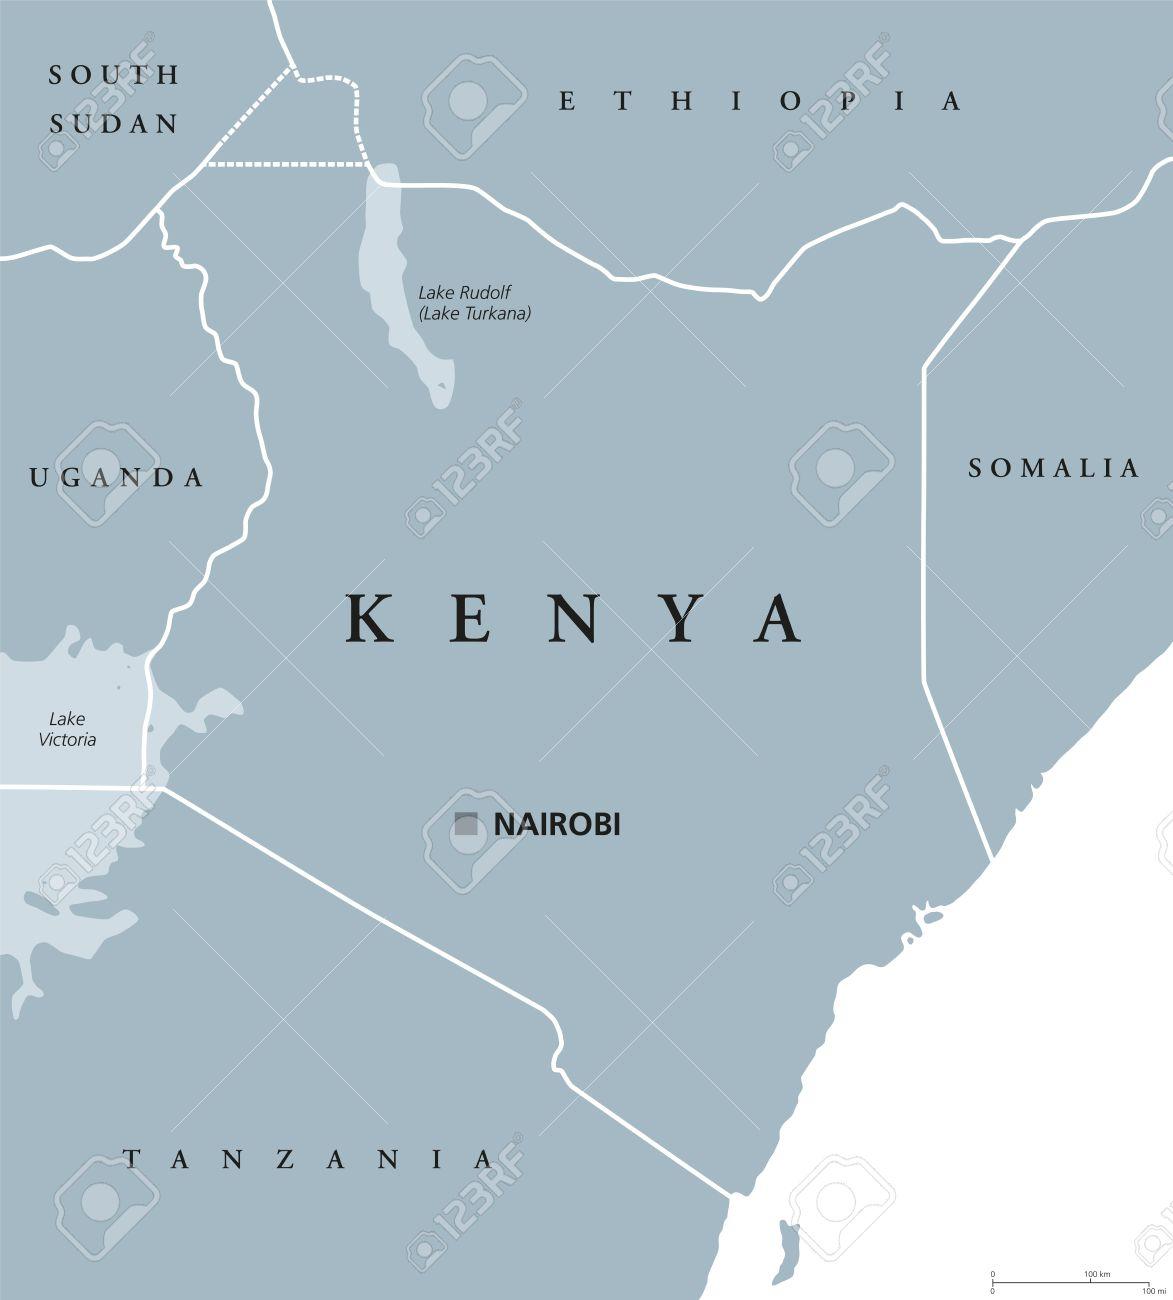 Kenya Political Map With Capital Nairobi. Republic In Africa